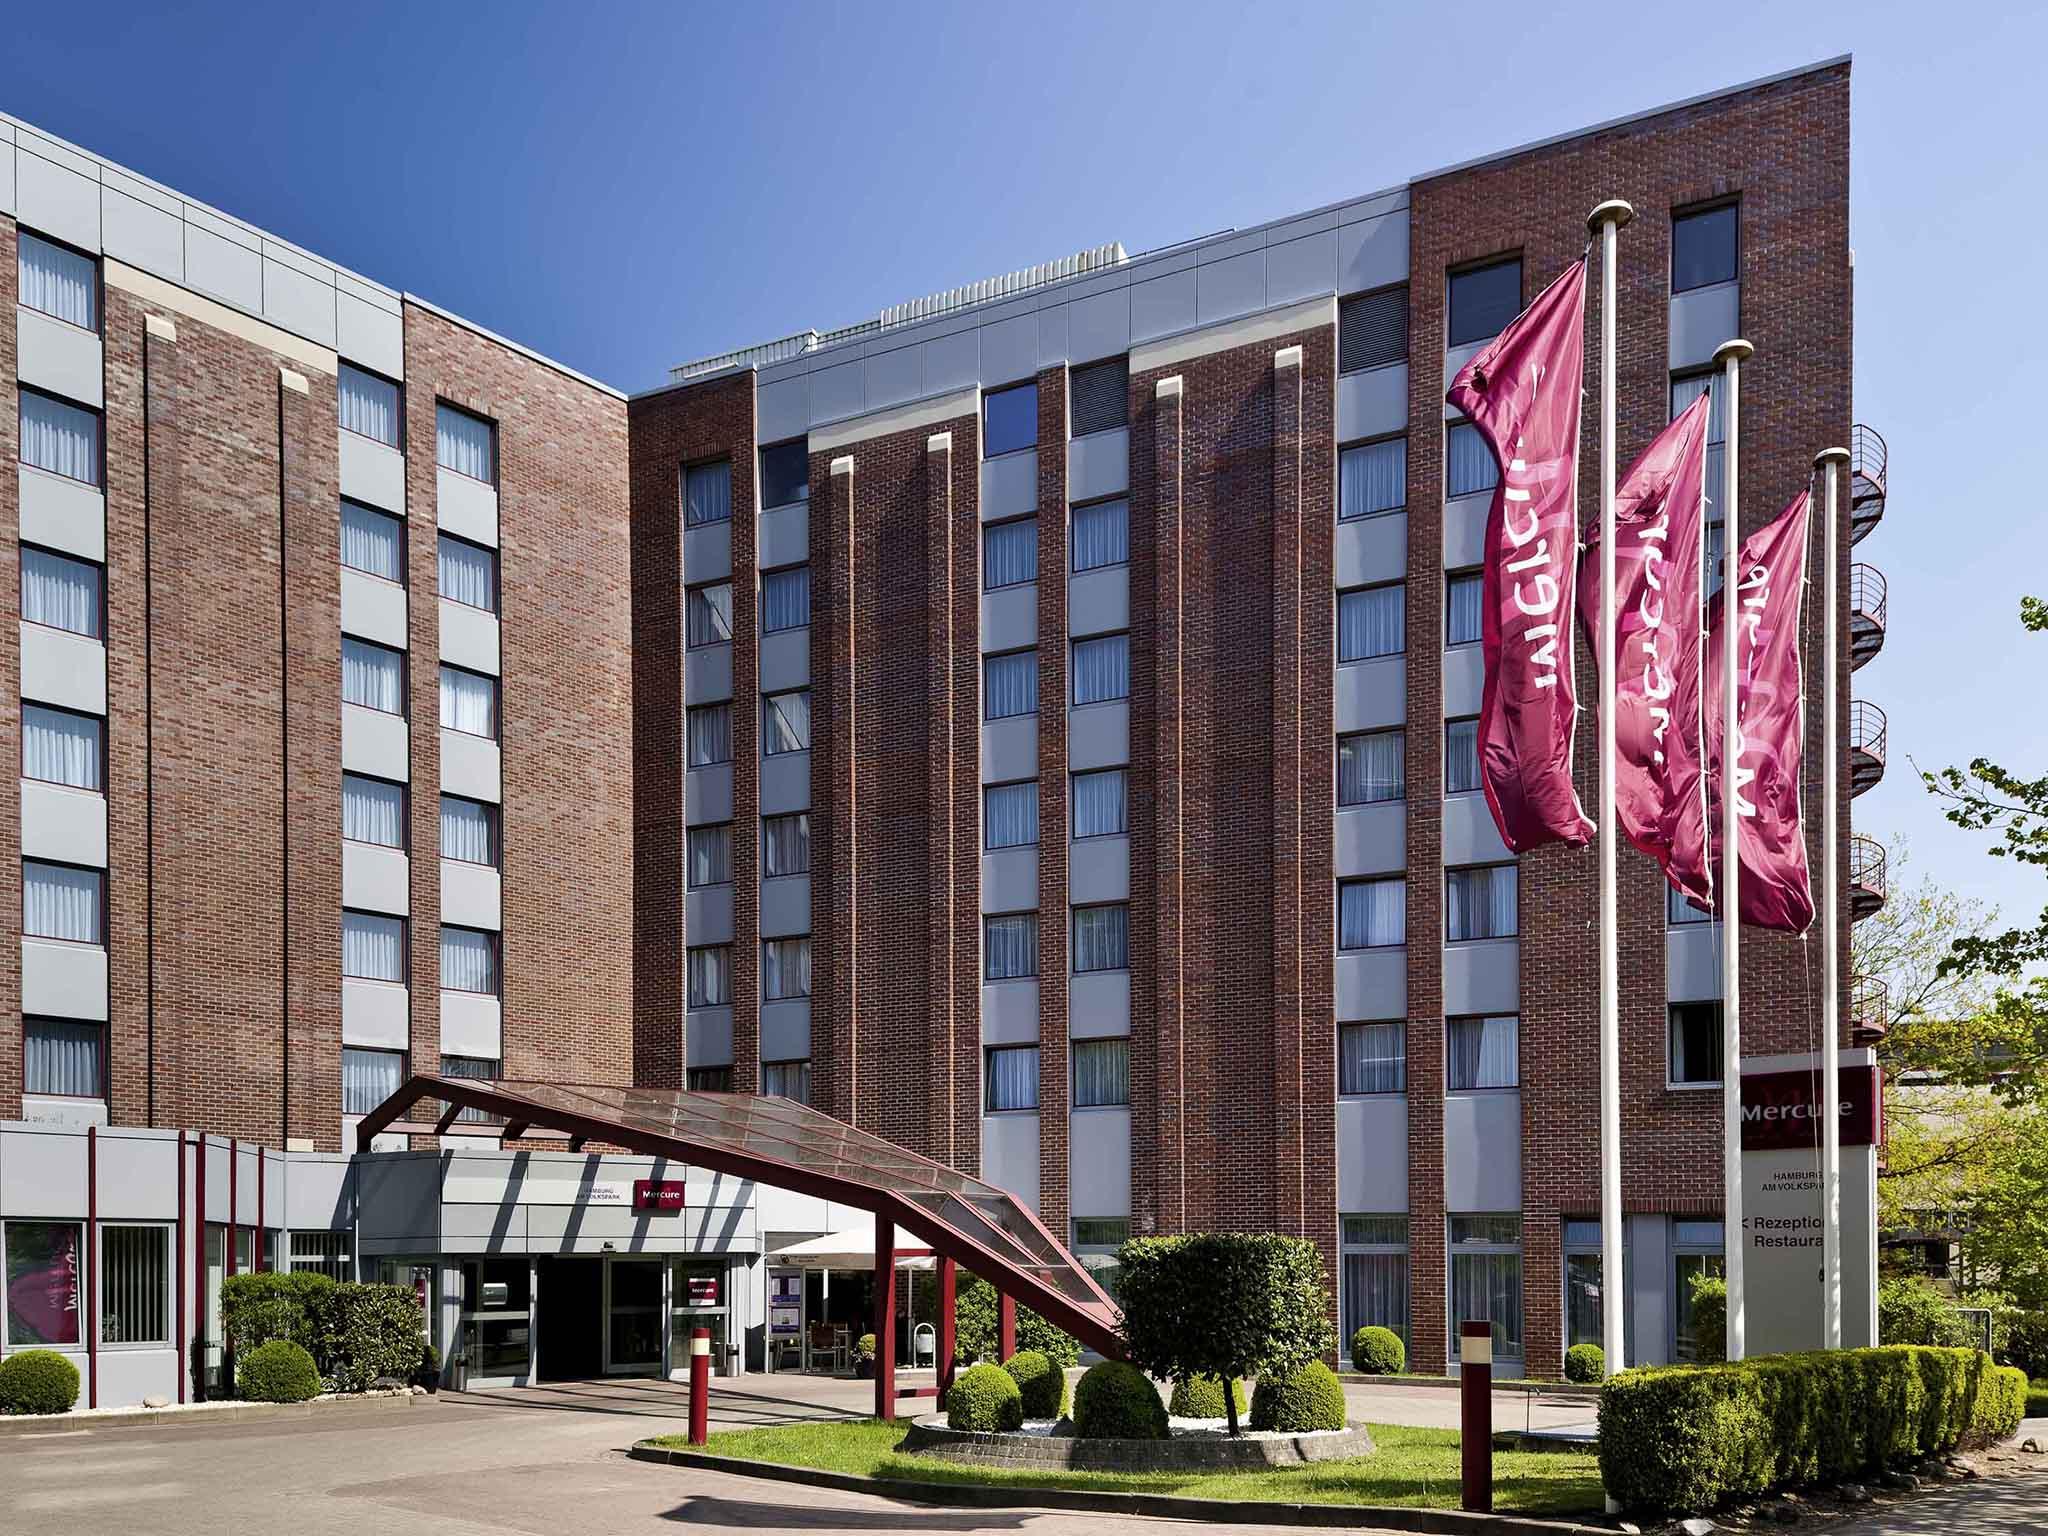 فندق - فندق مركيور Mercure هامبورغ أم فولكسبارك